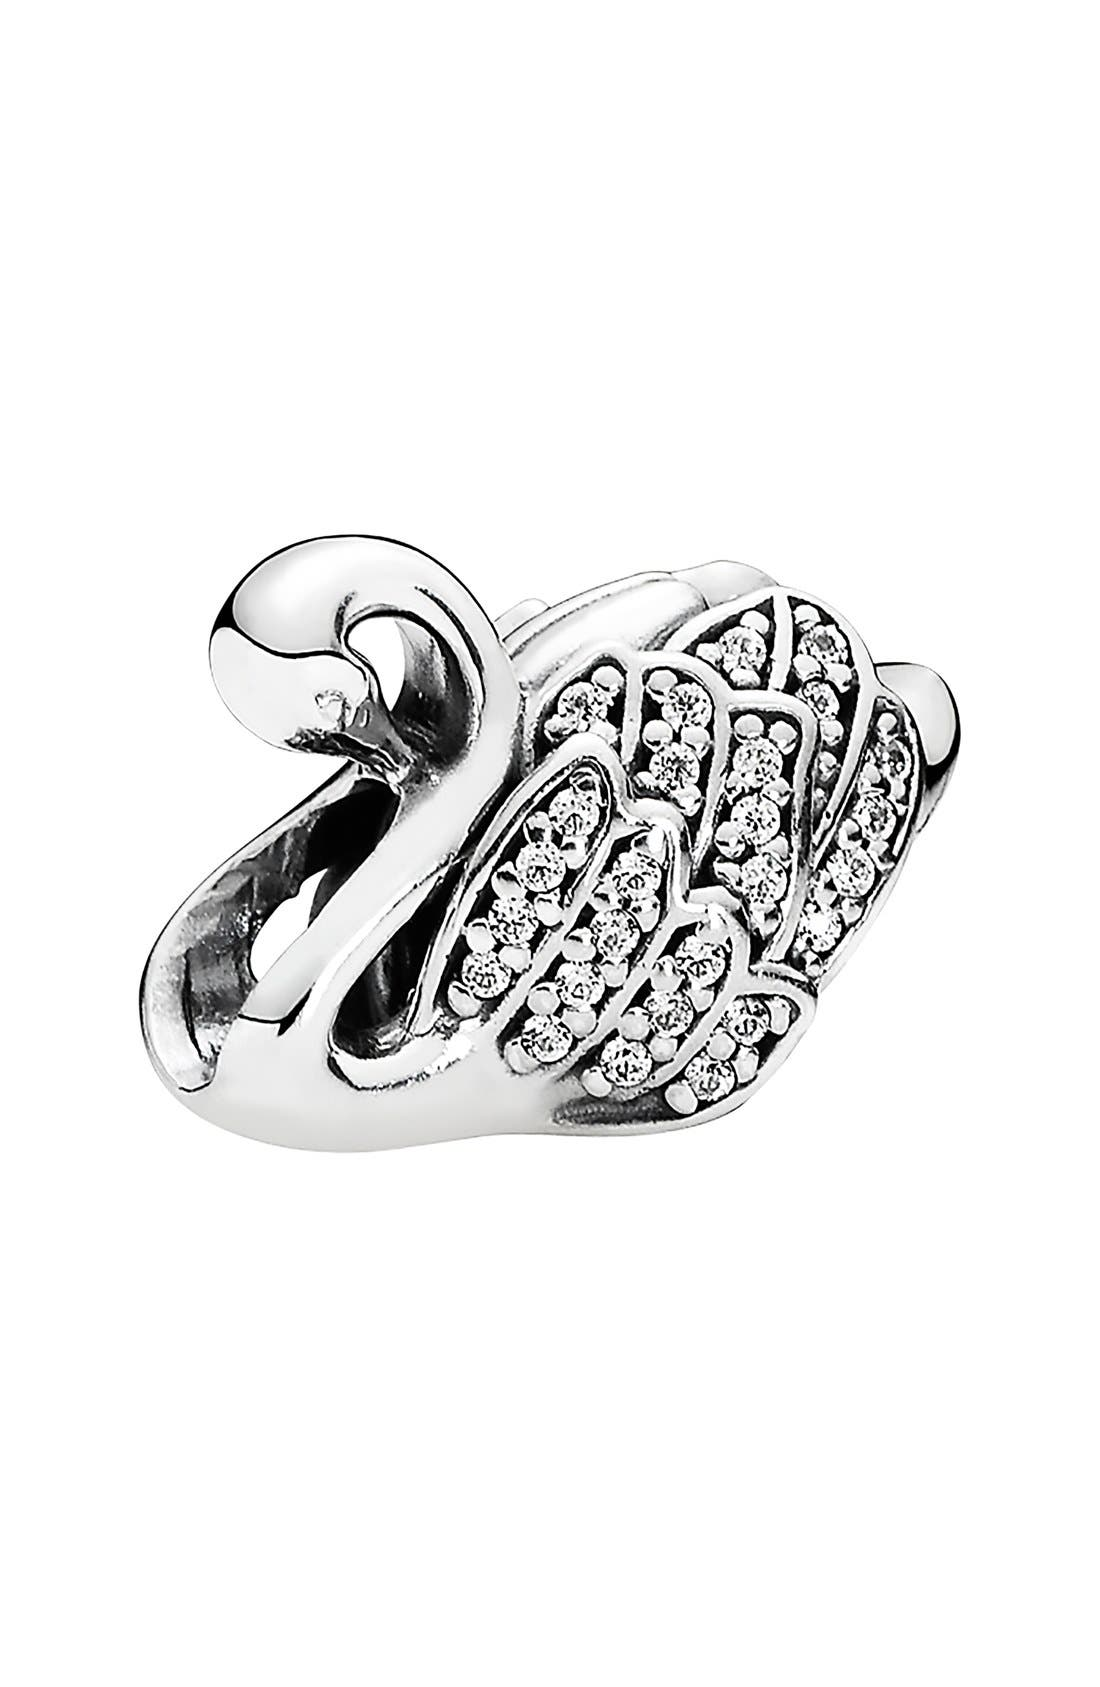 'Majestic Swan' Charm,                             Main thumbnail 1, color,                             040